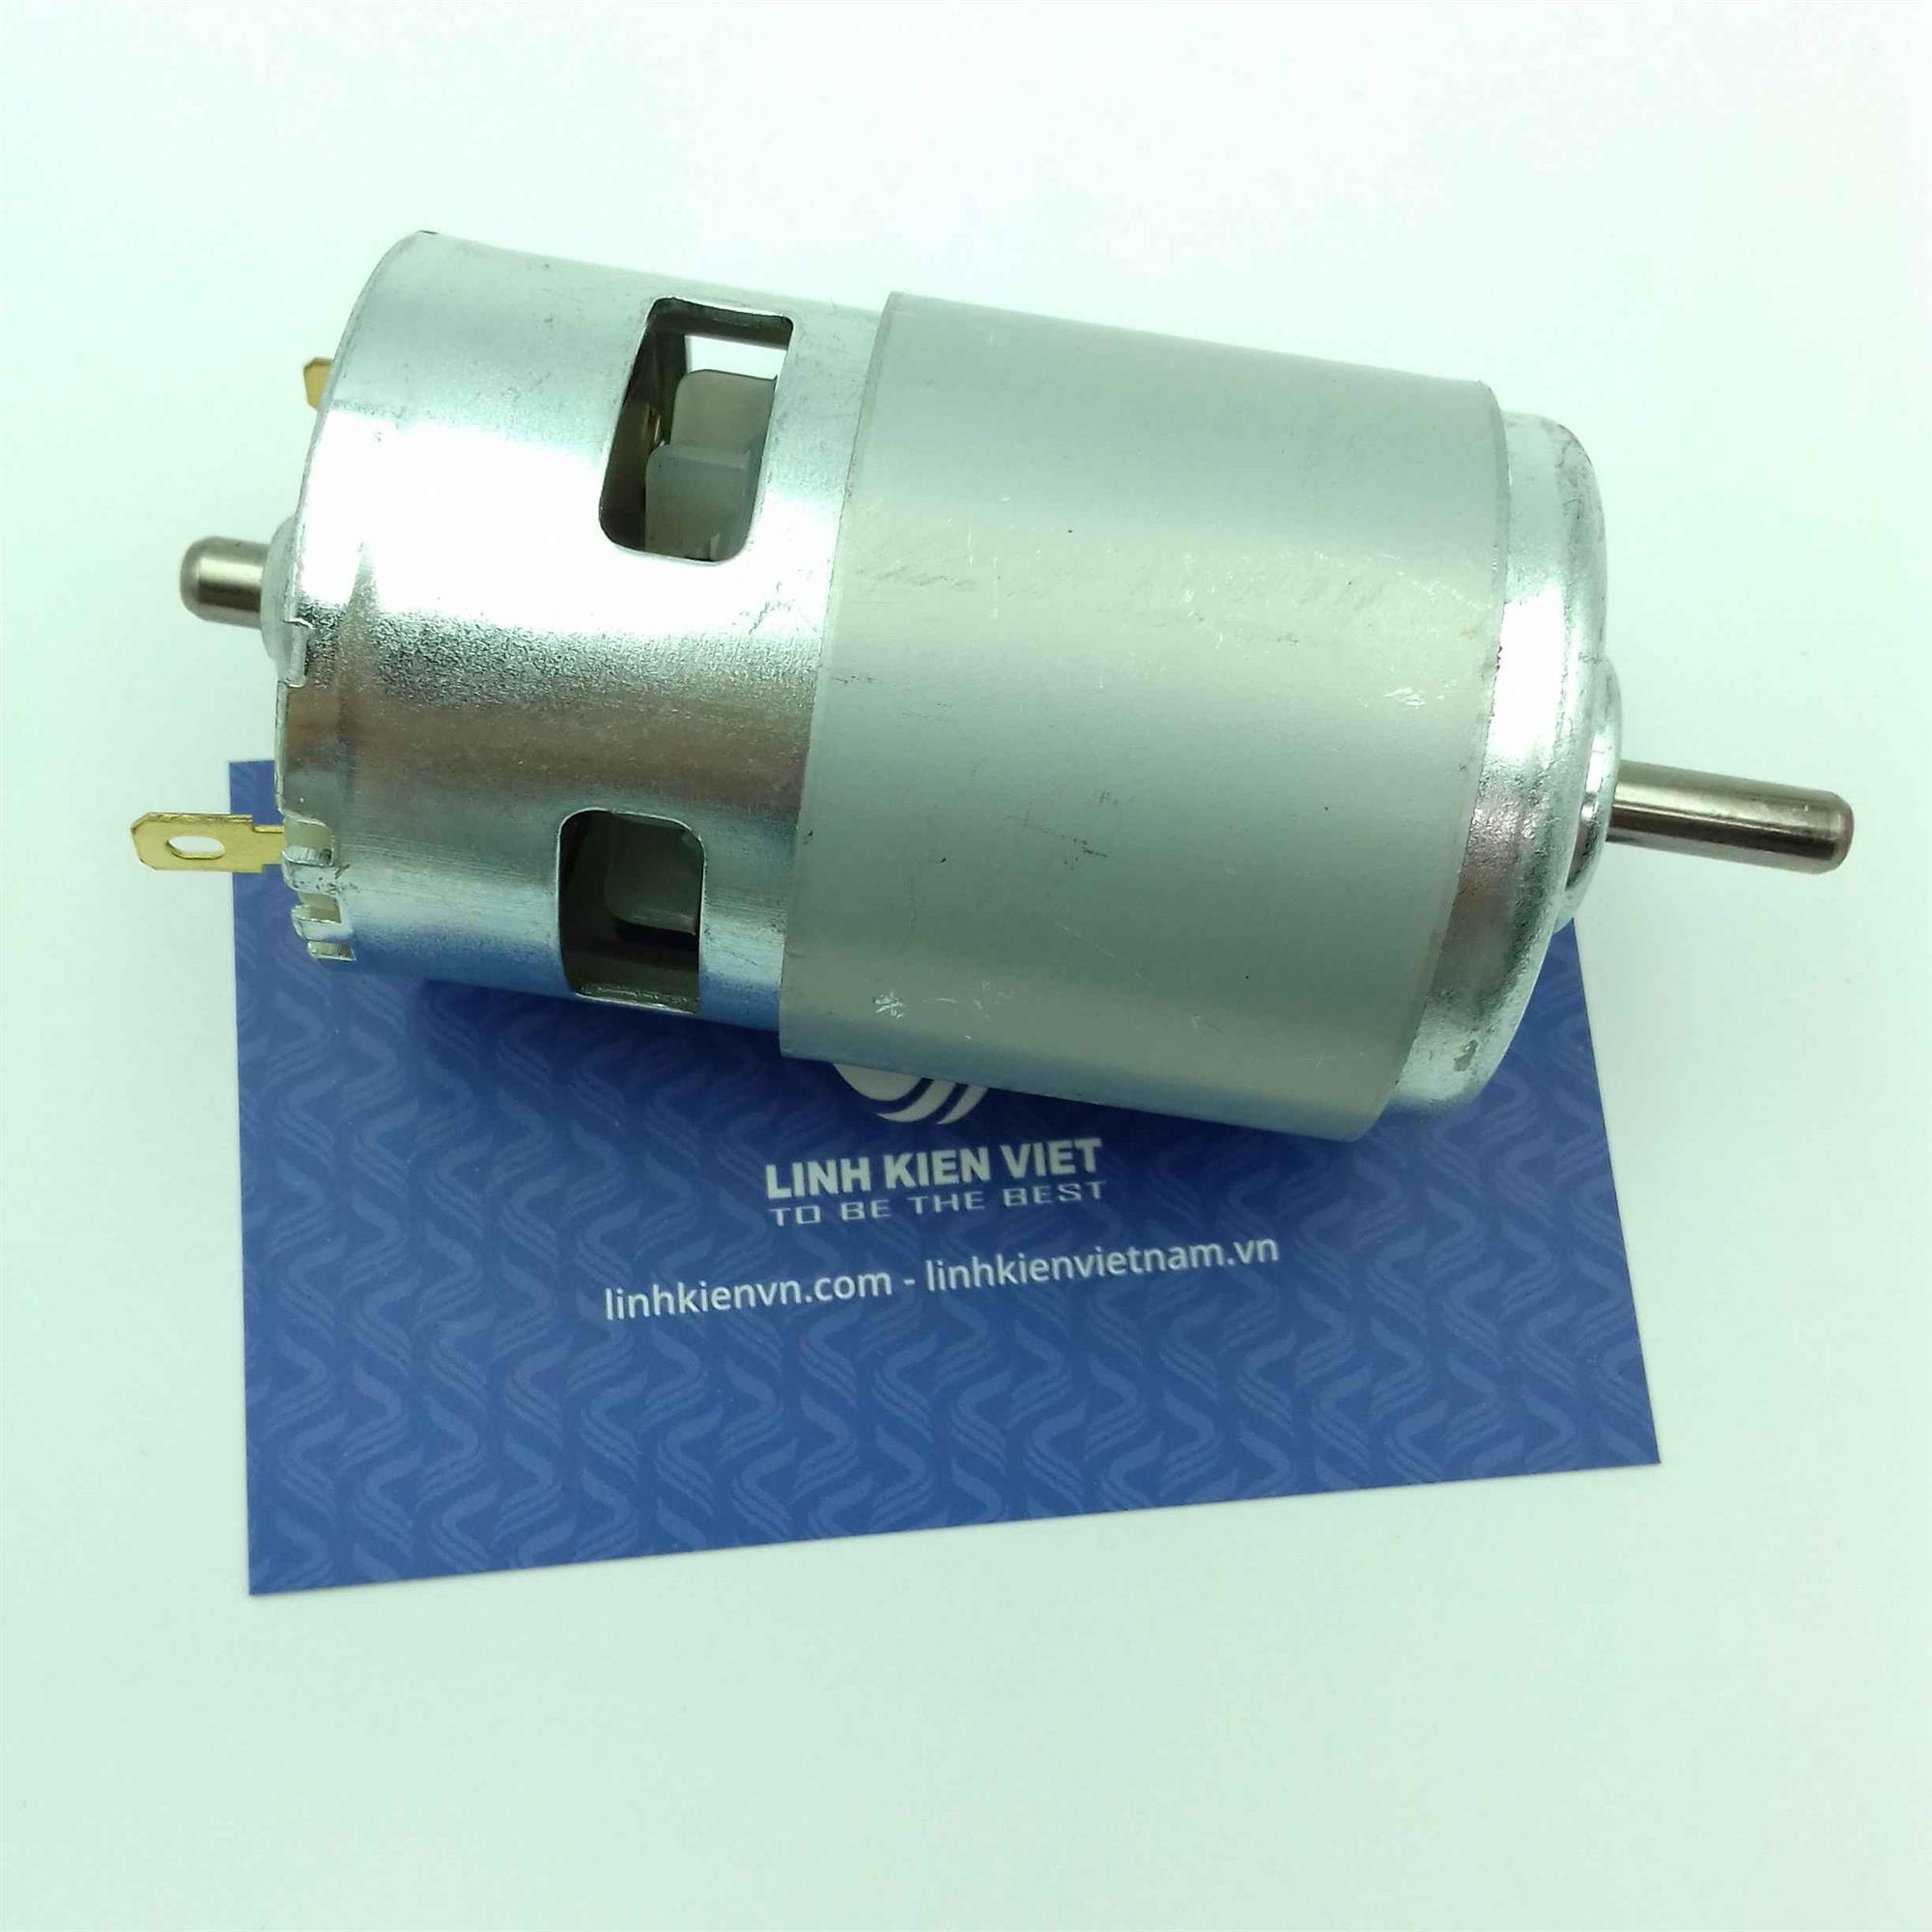 dong-co-775-1-dau-12v-18000-rpm-150w-sieu-manh